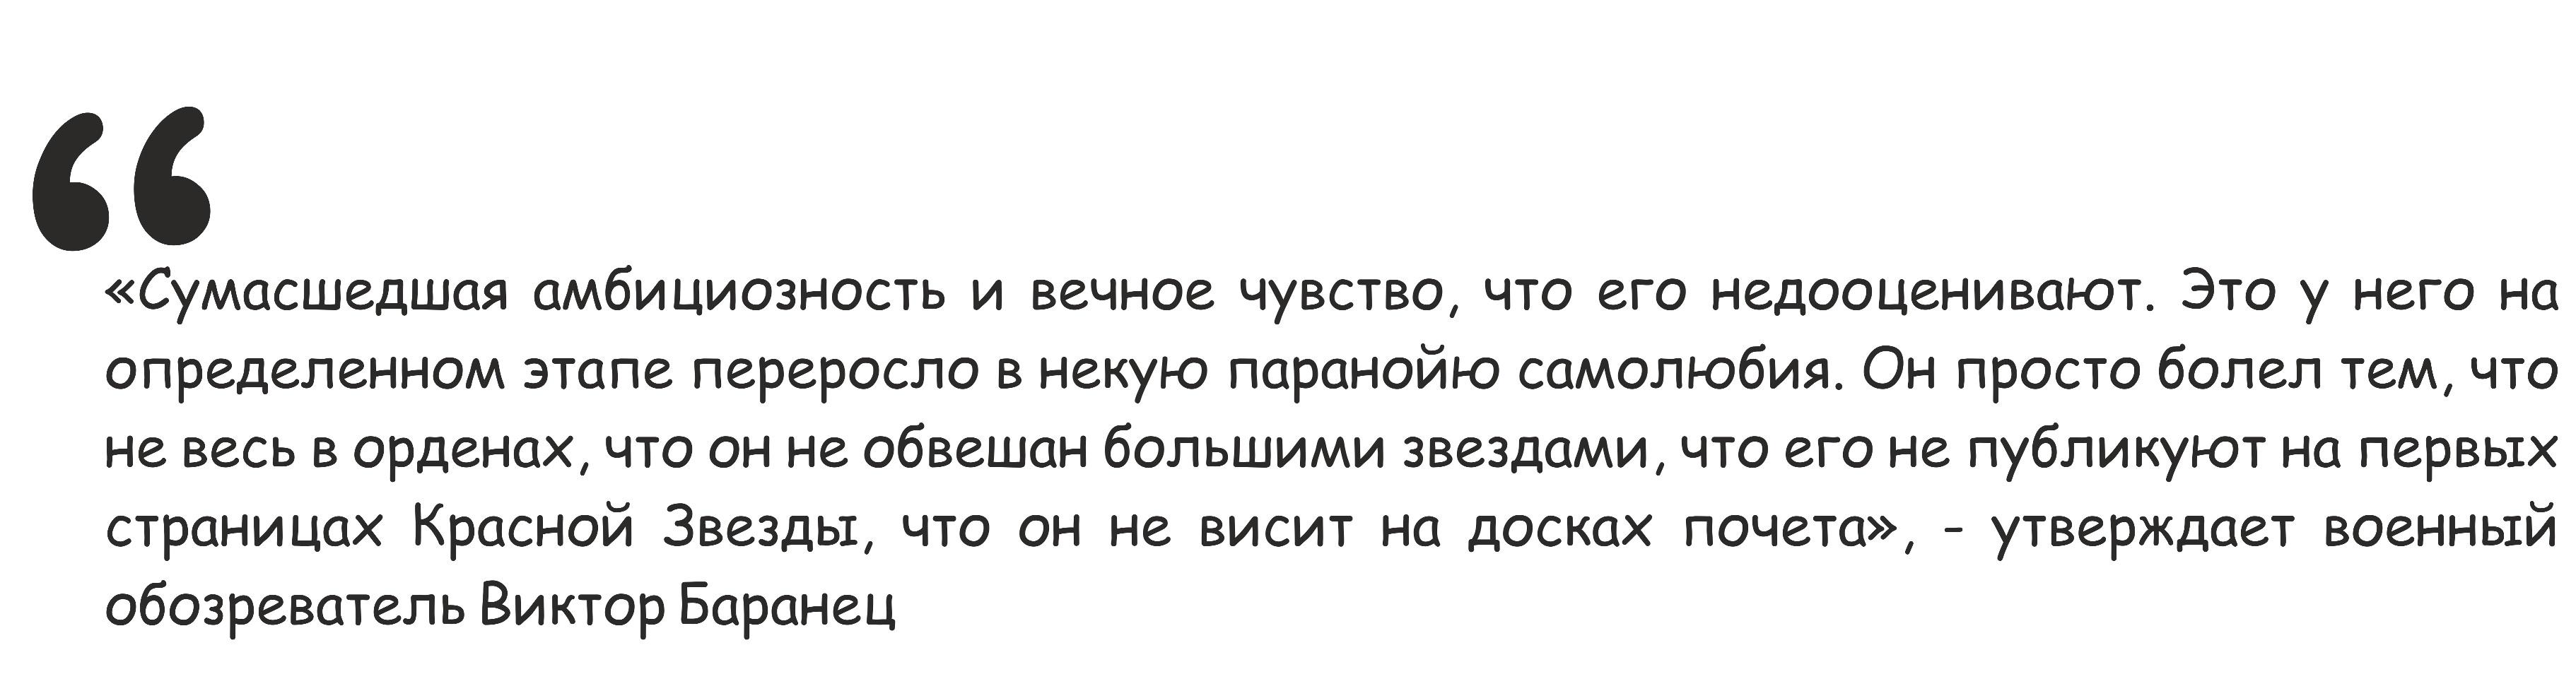 Vladimirov for Koi 5 anopcharik patra